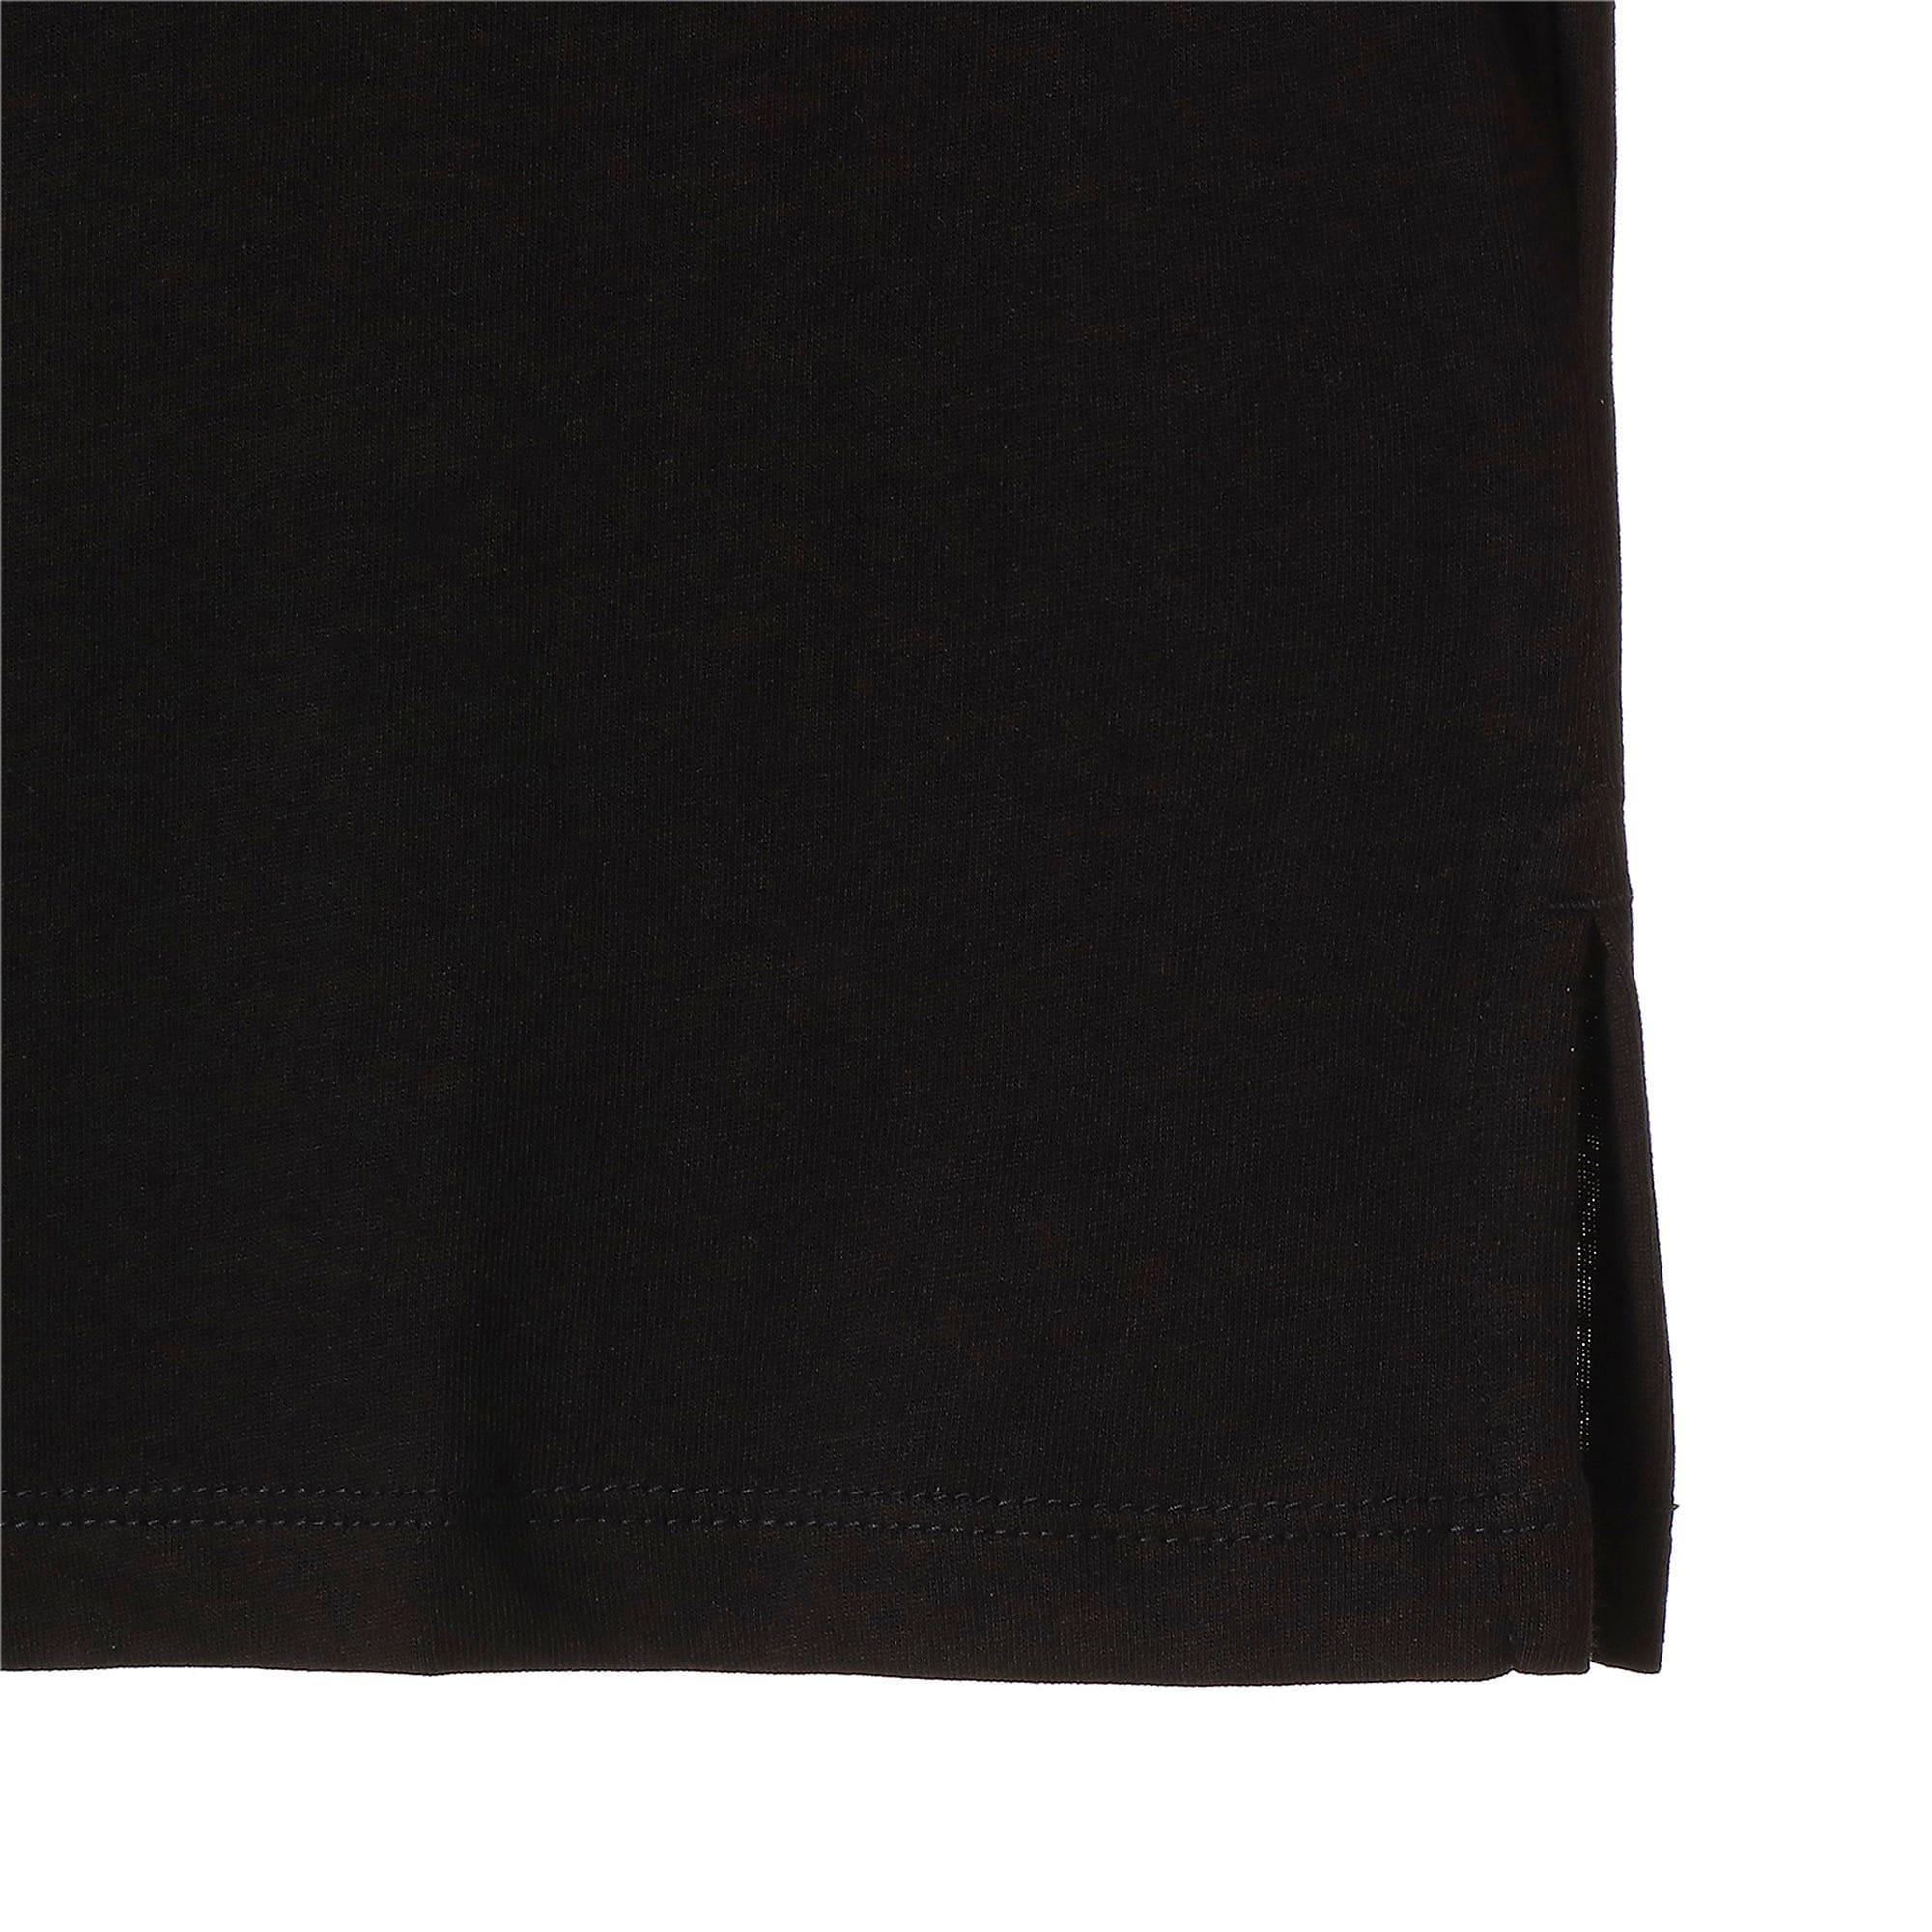 Thumbnail 6 of CLOUD パック ウィメンズ グラフィック Tシャツ, Puma Black, medium-JPN